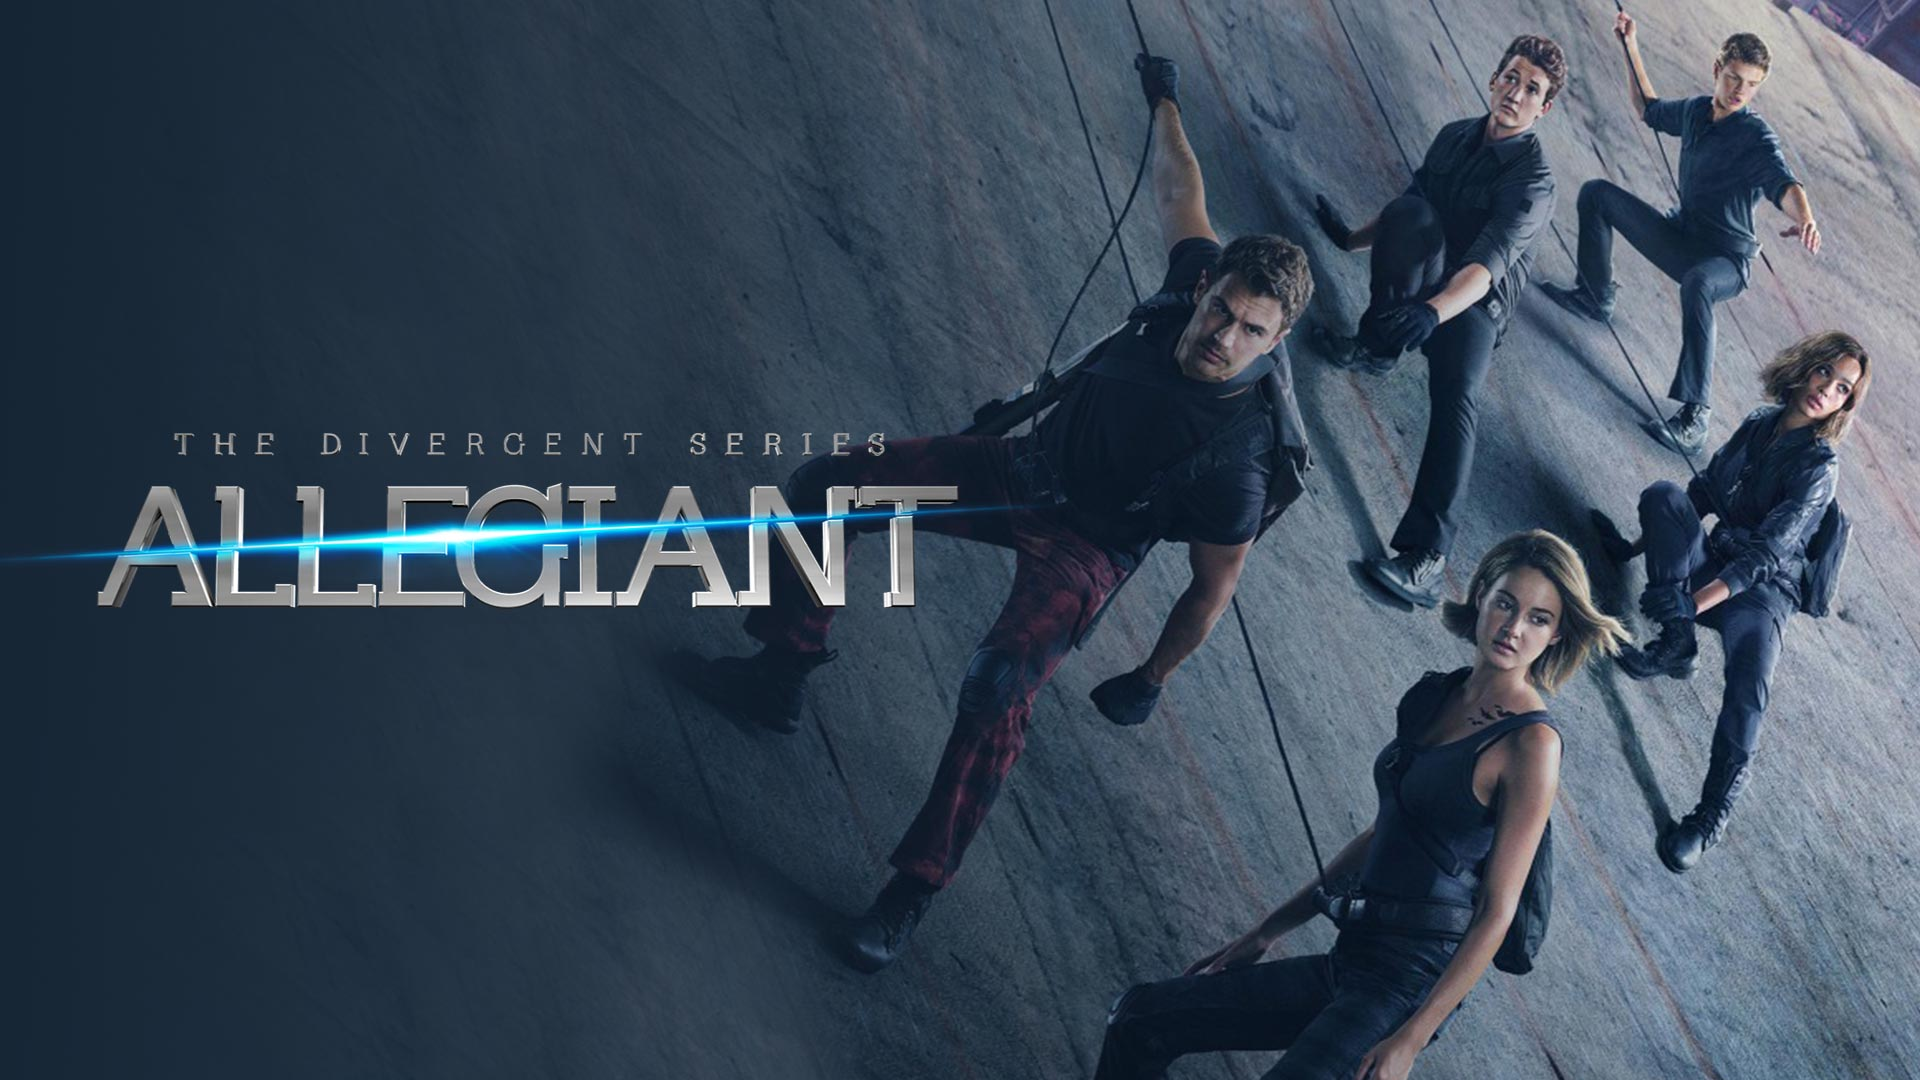 The Divergent Series: Allegiant (HDR) (en) (4K UHD)